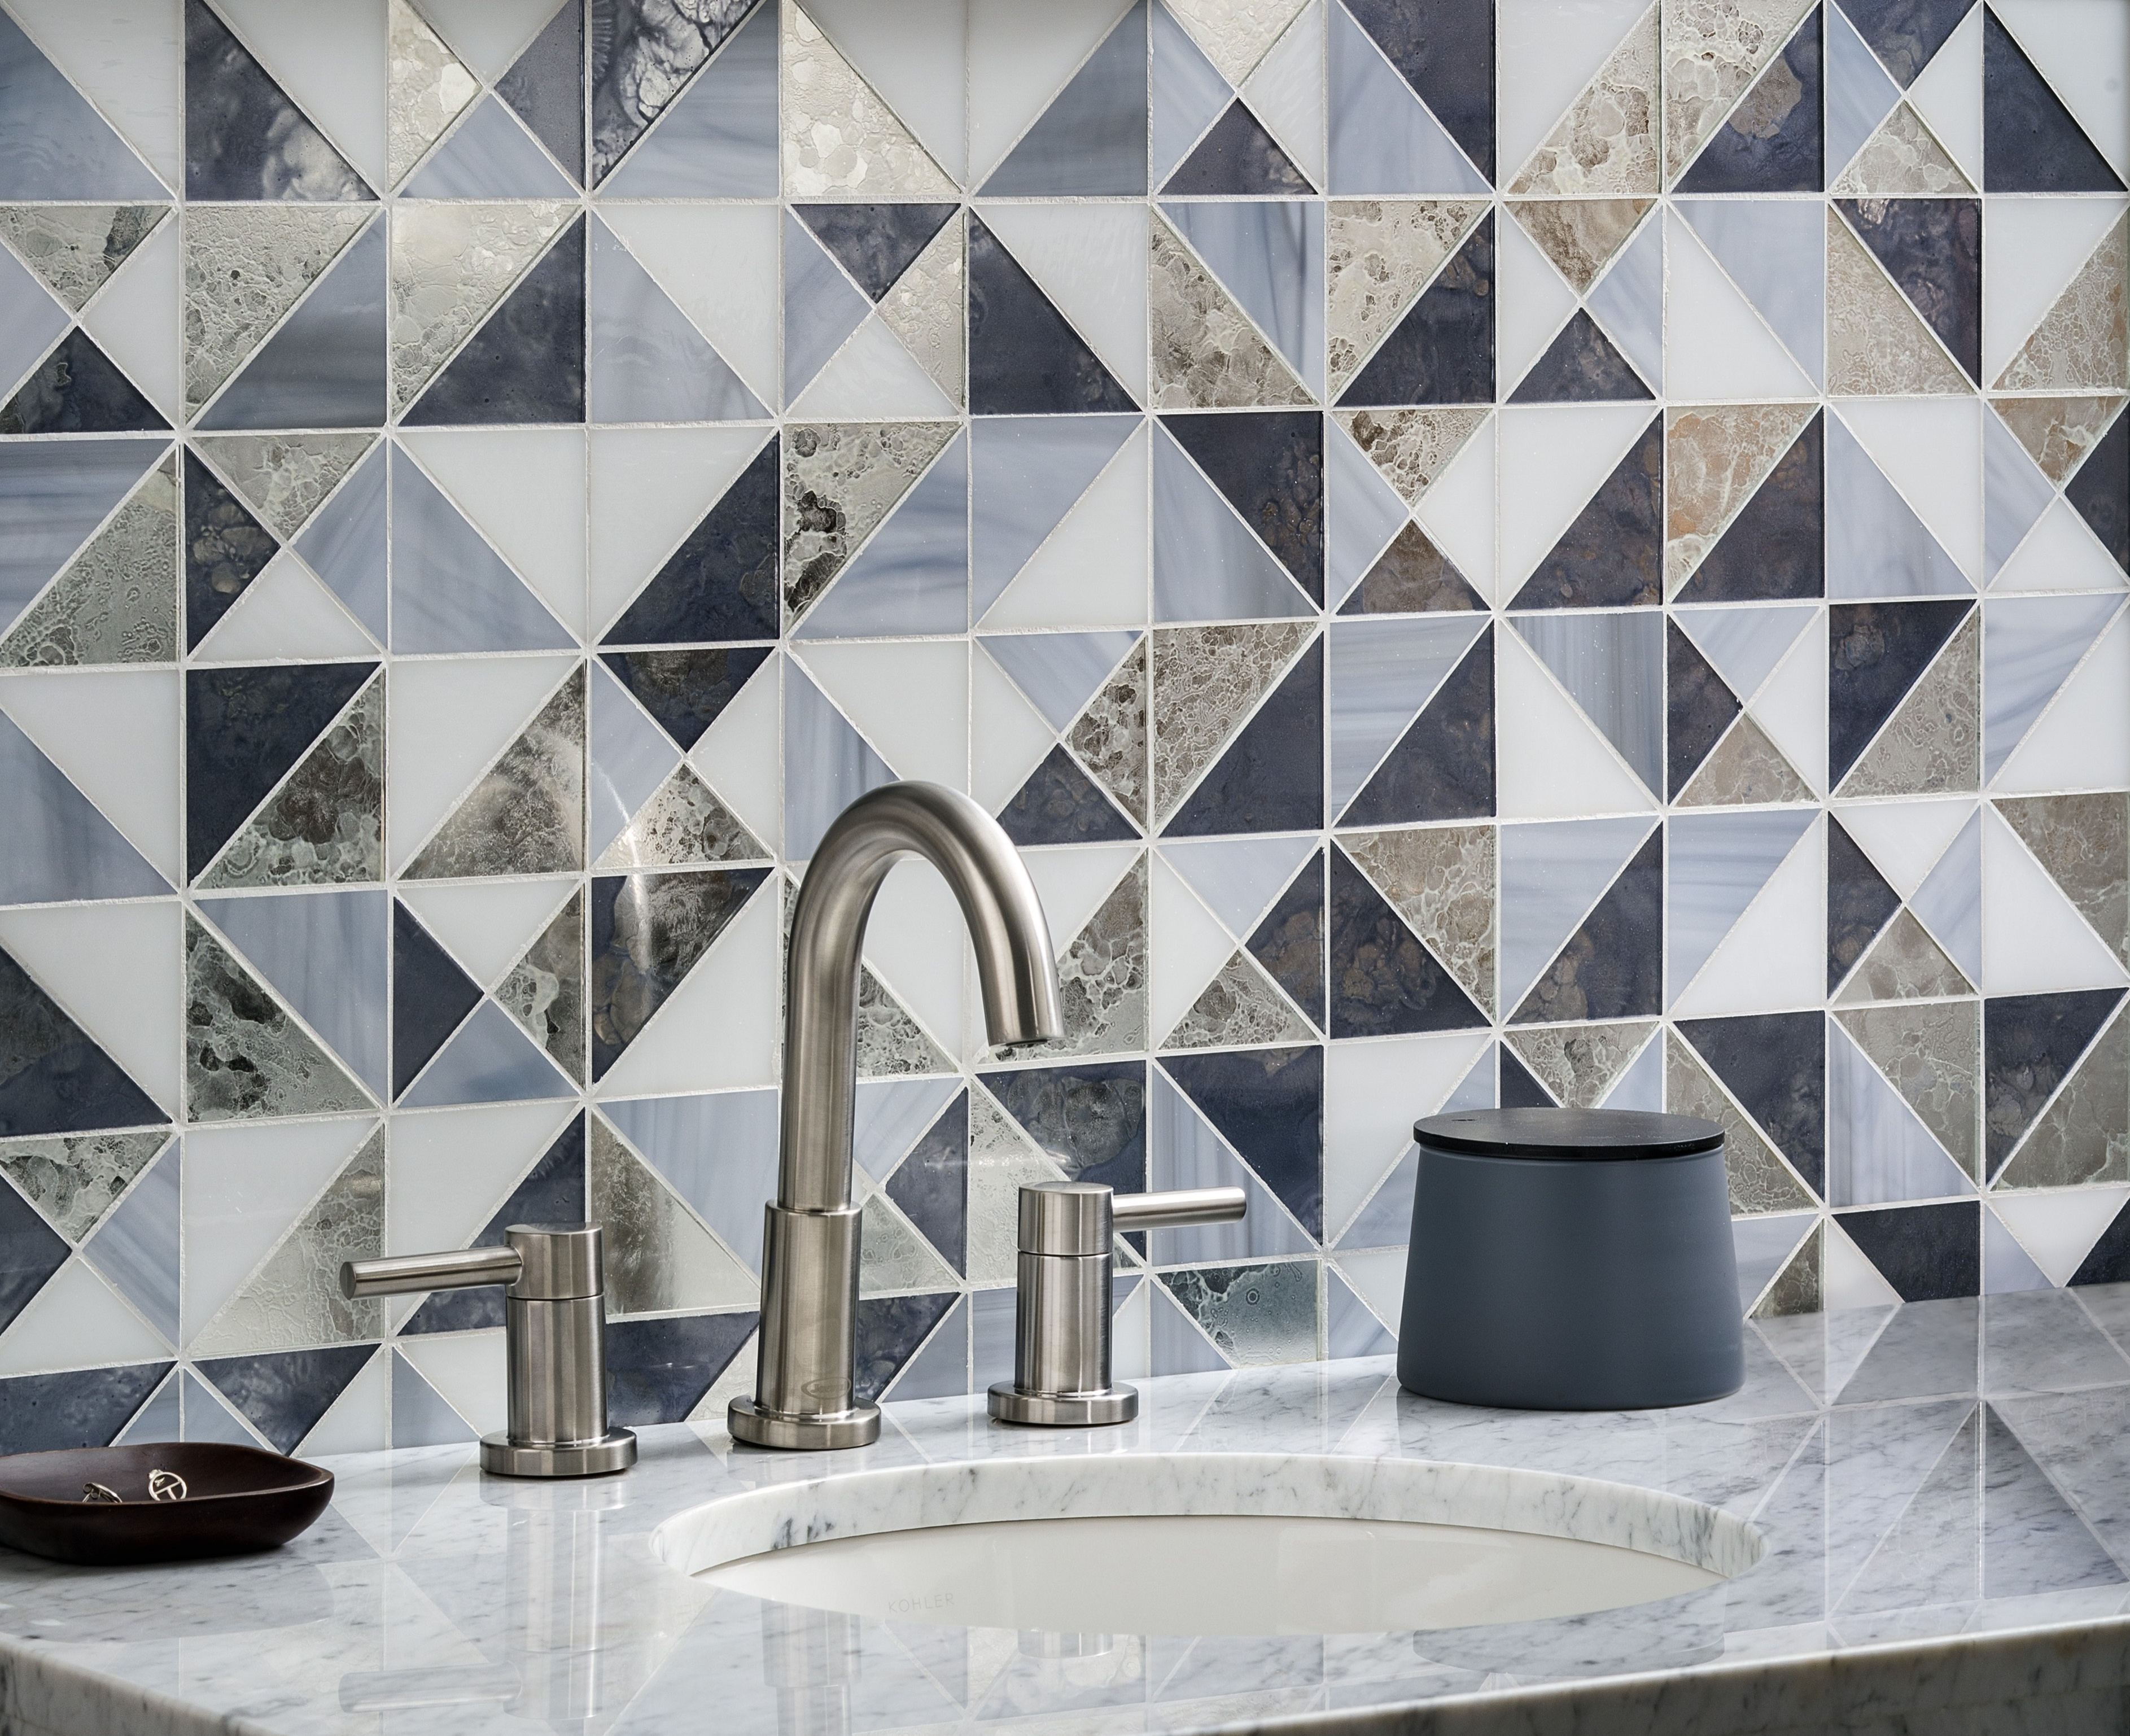 Bathroom-backsplash-tile-antique-mirror-blue-glass-modern-design-idea-680796-edited.jpg